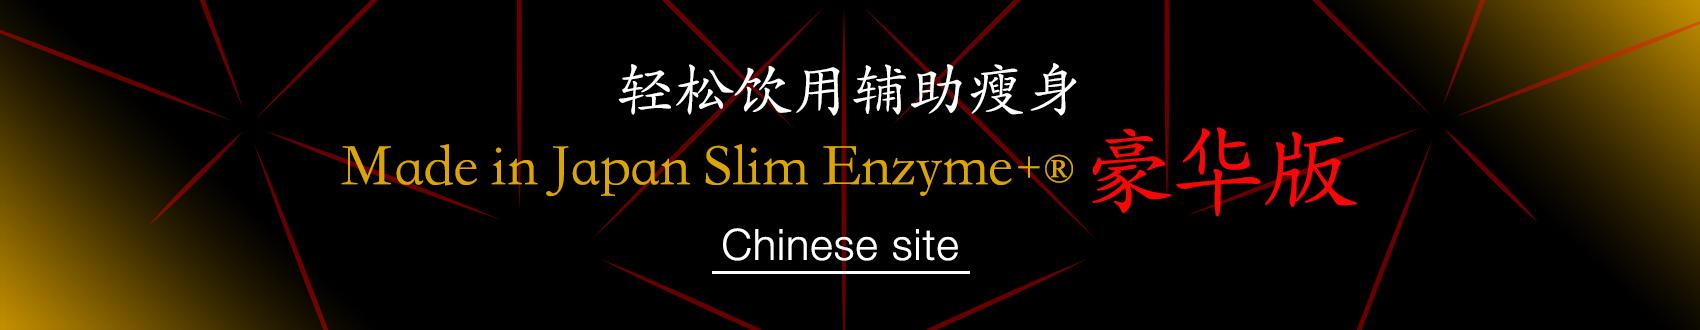 轻松饮用辅助瘦身 Made in Japan Slim Enzyme+®️ 豪华版